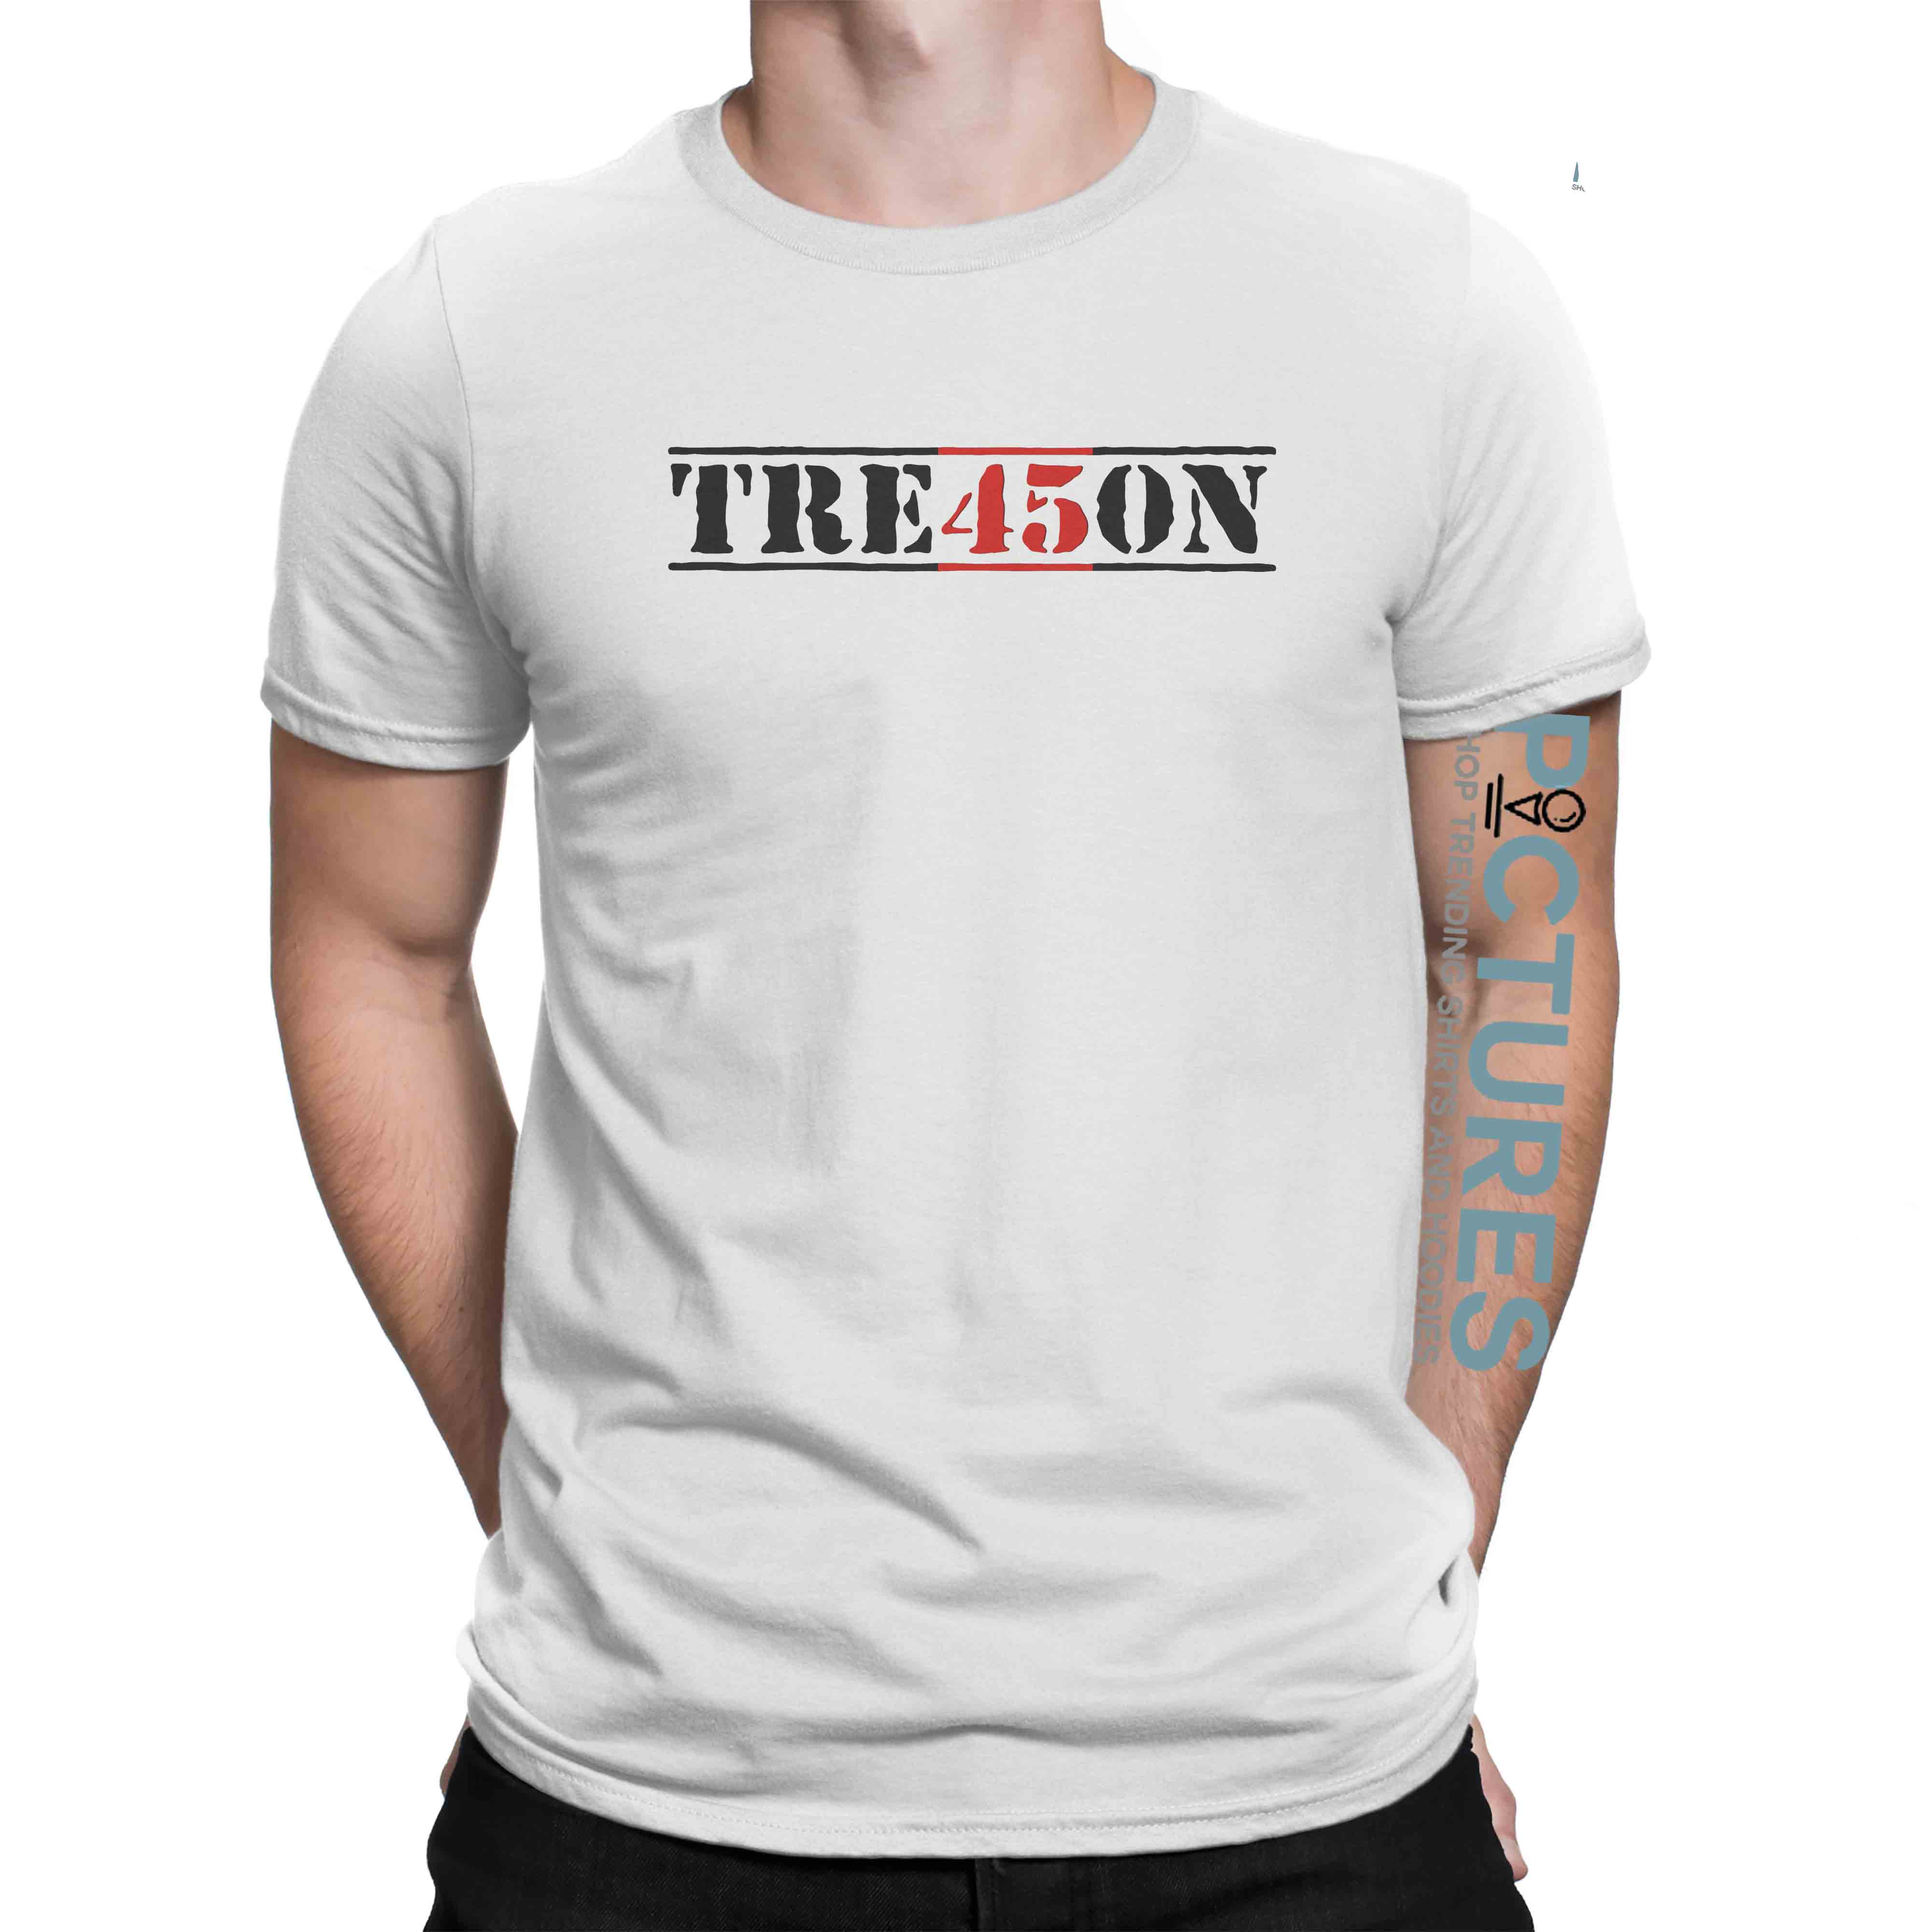 Tre45on shirt